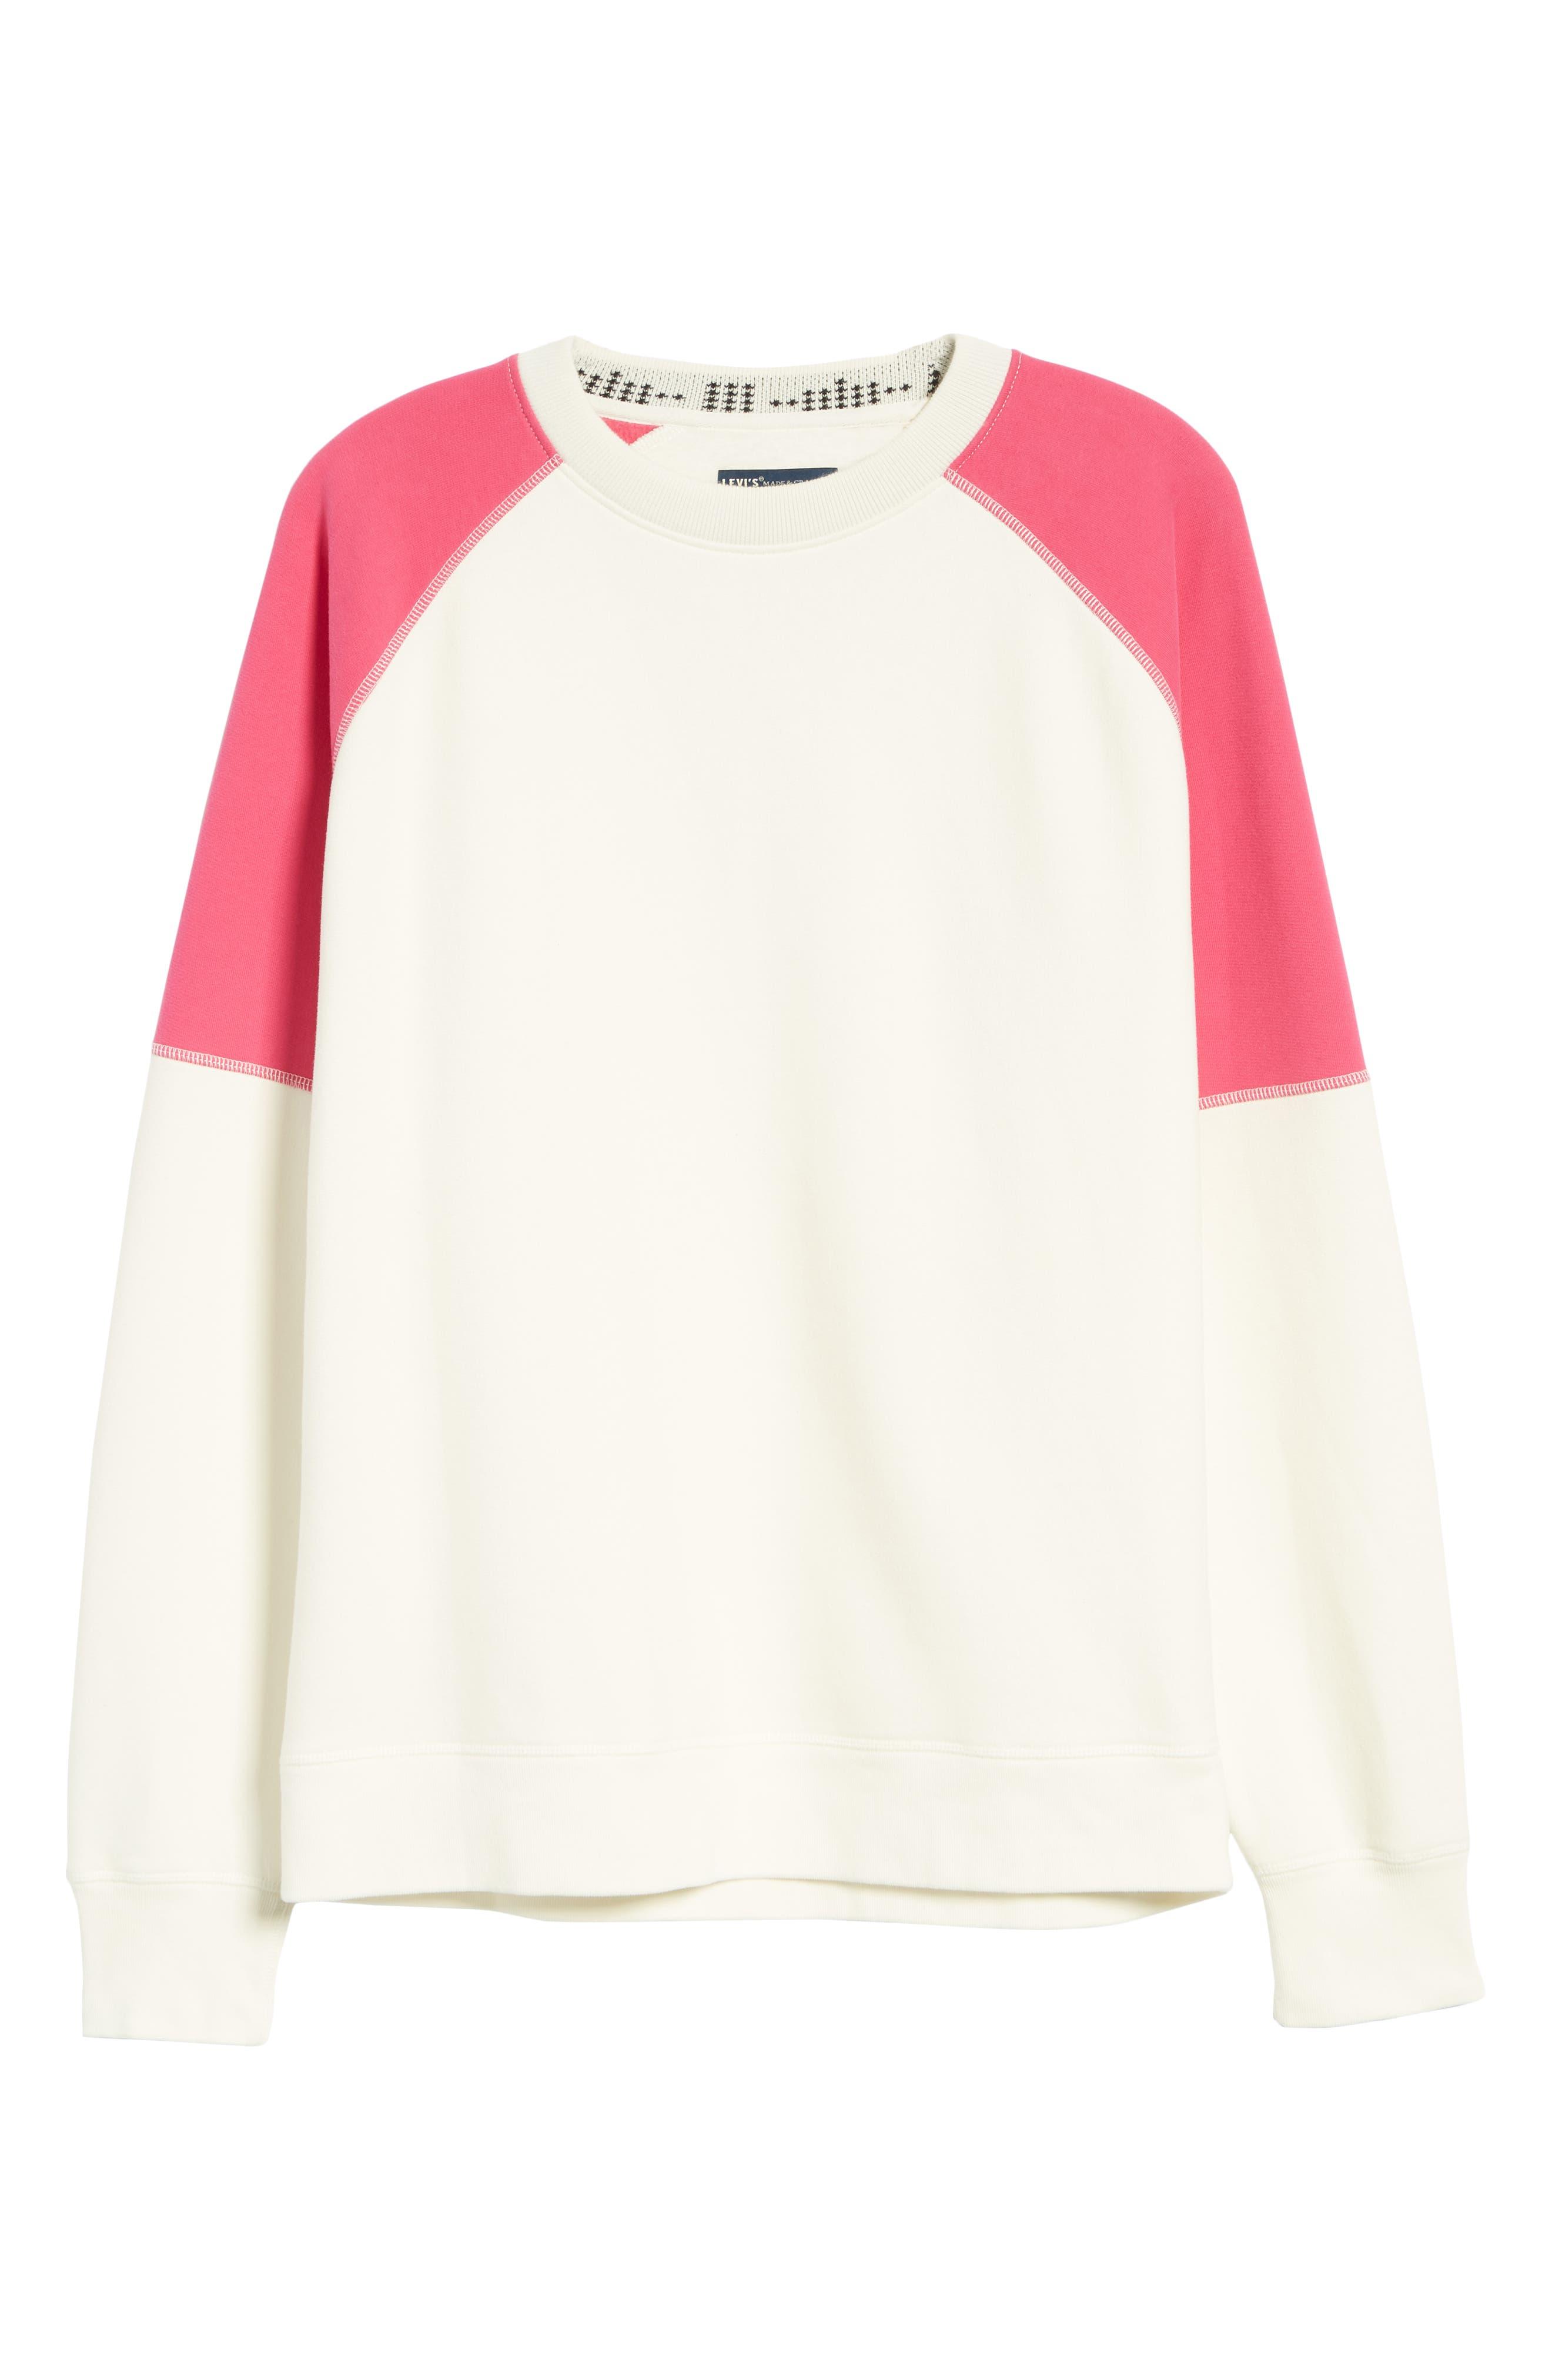 LEVI'S<SUP>®</SUP> MADE & CRAFTED<SUP>™</SUP>, Regular Fit Raglan Sweatshirt, Alternate thumbnail 6, color, WHITE ALYSSUM